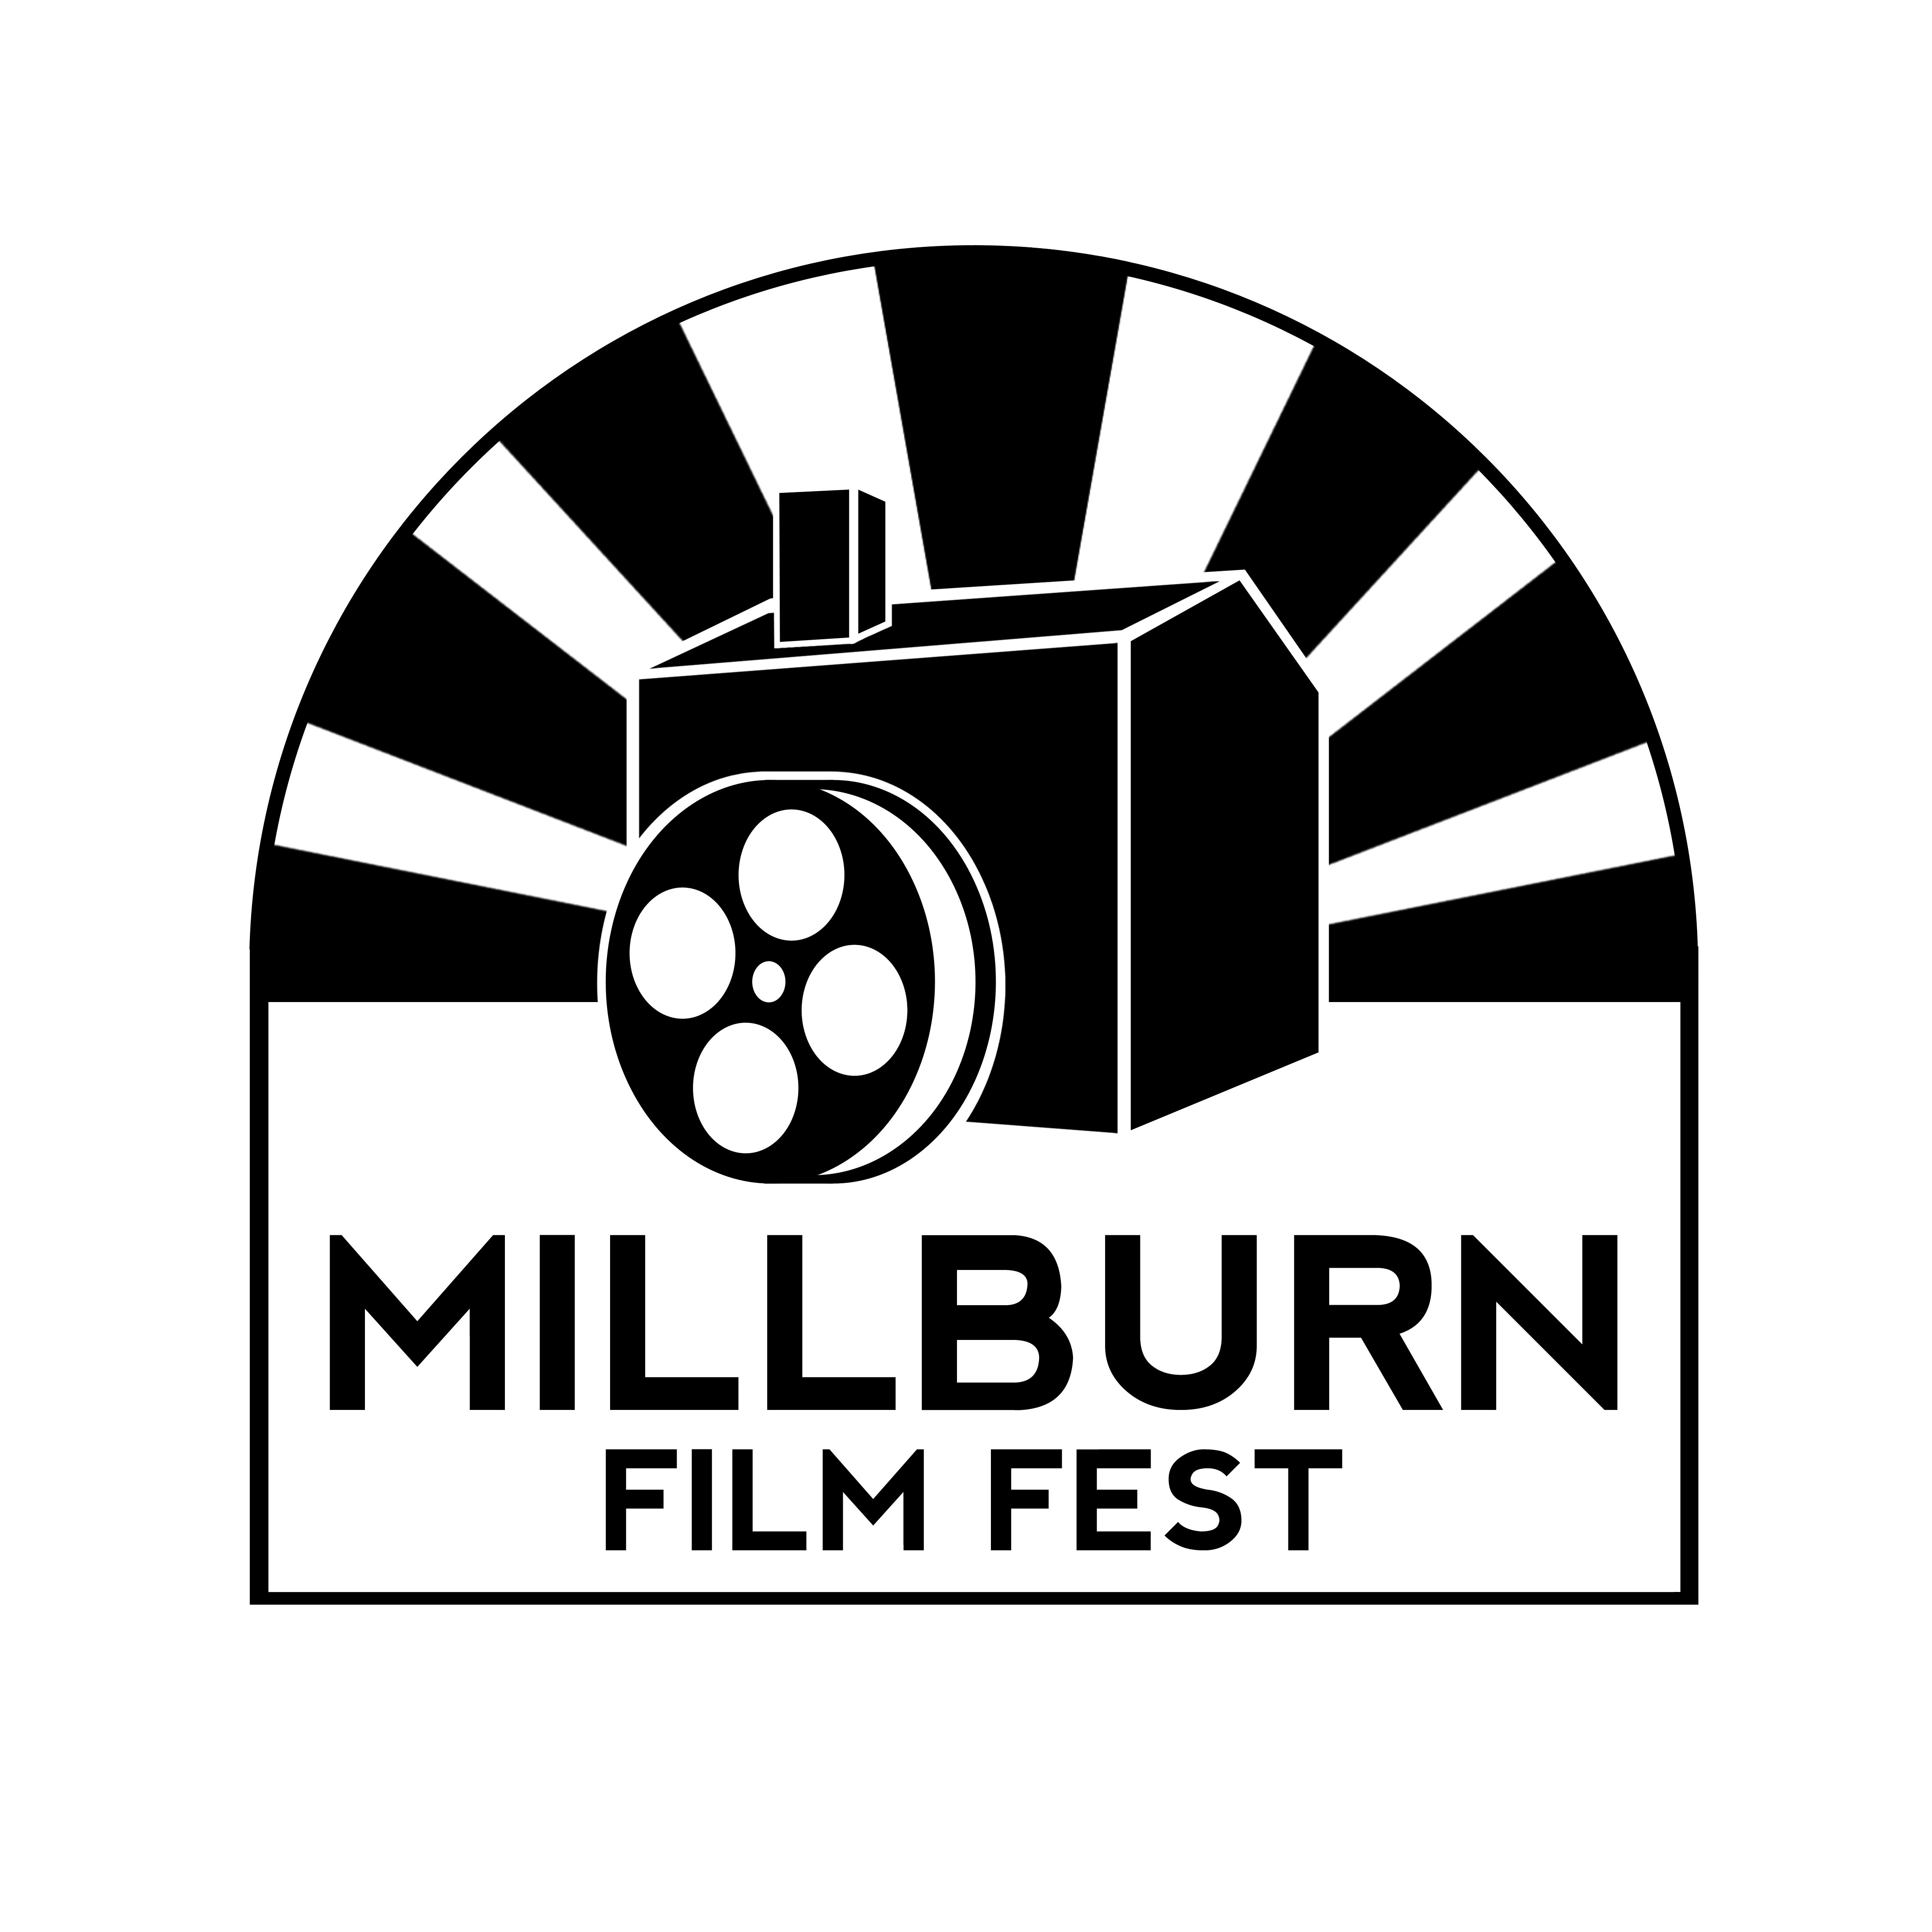 44ba0bc415267c9bb60f_millburn_film_fest_logo_1_.jpg